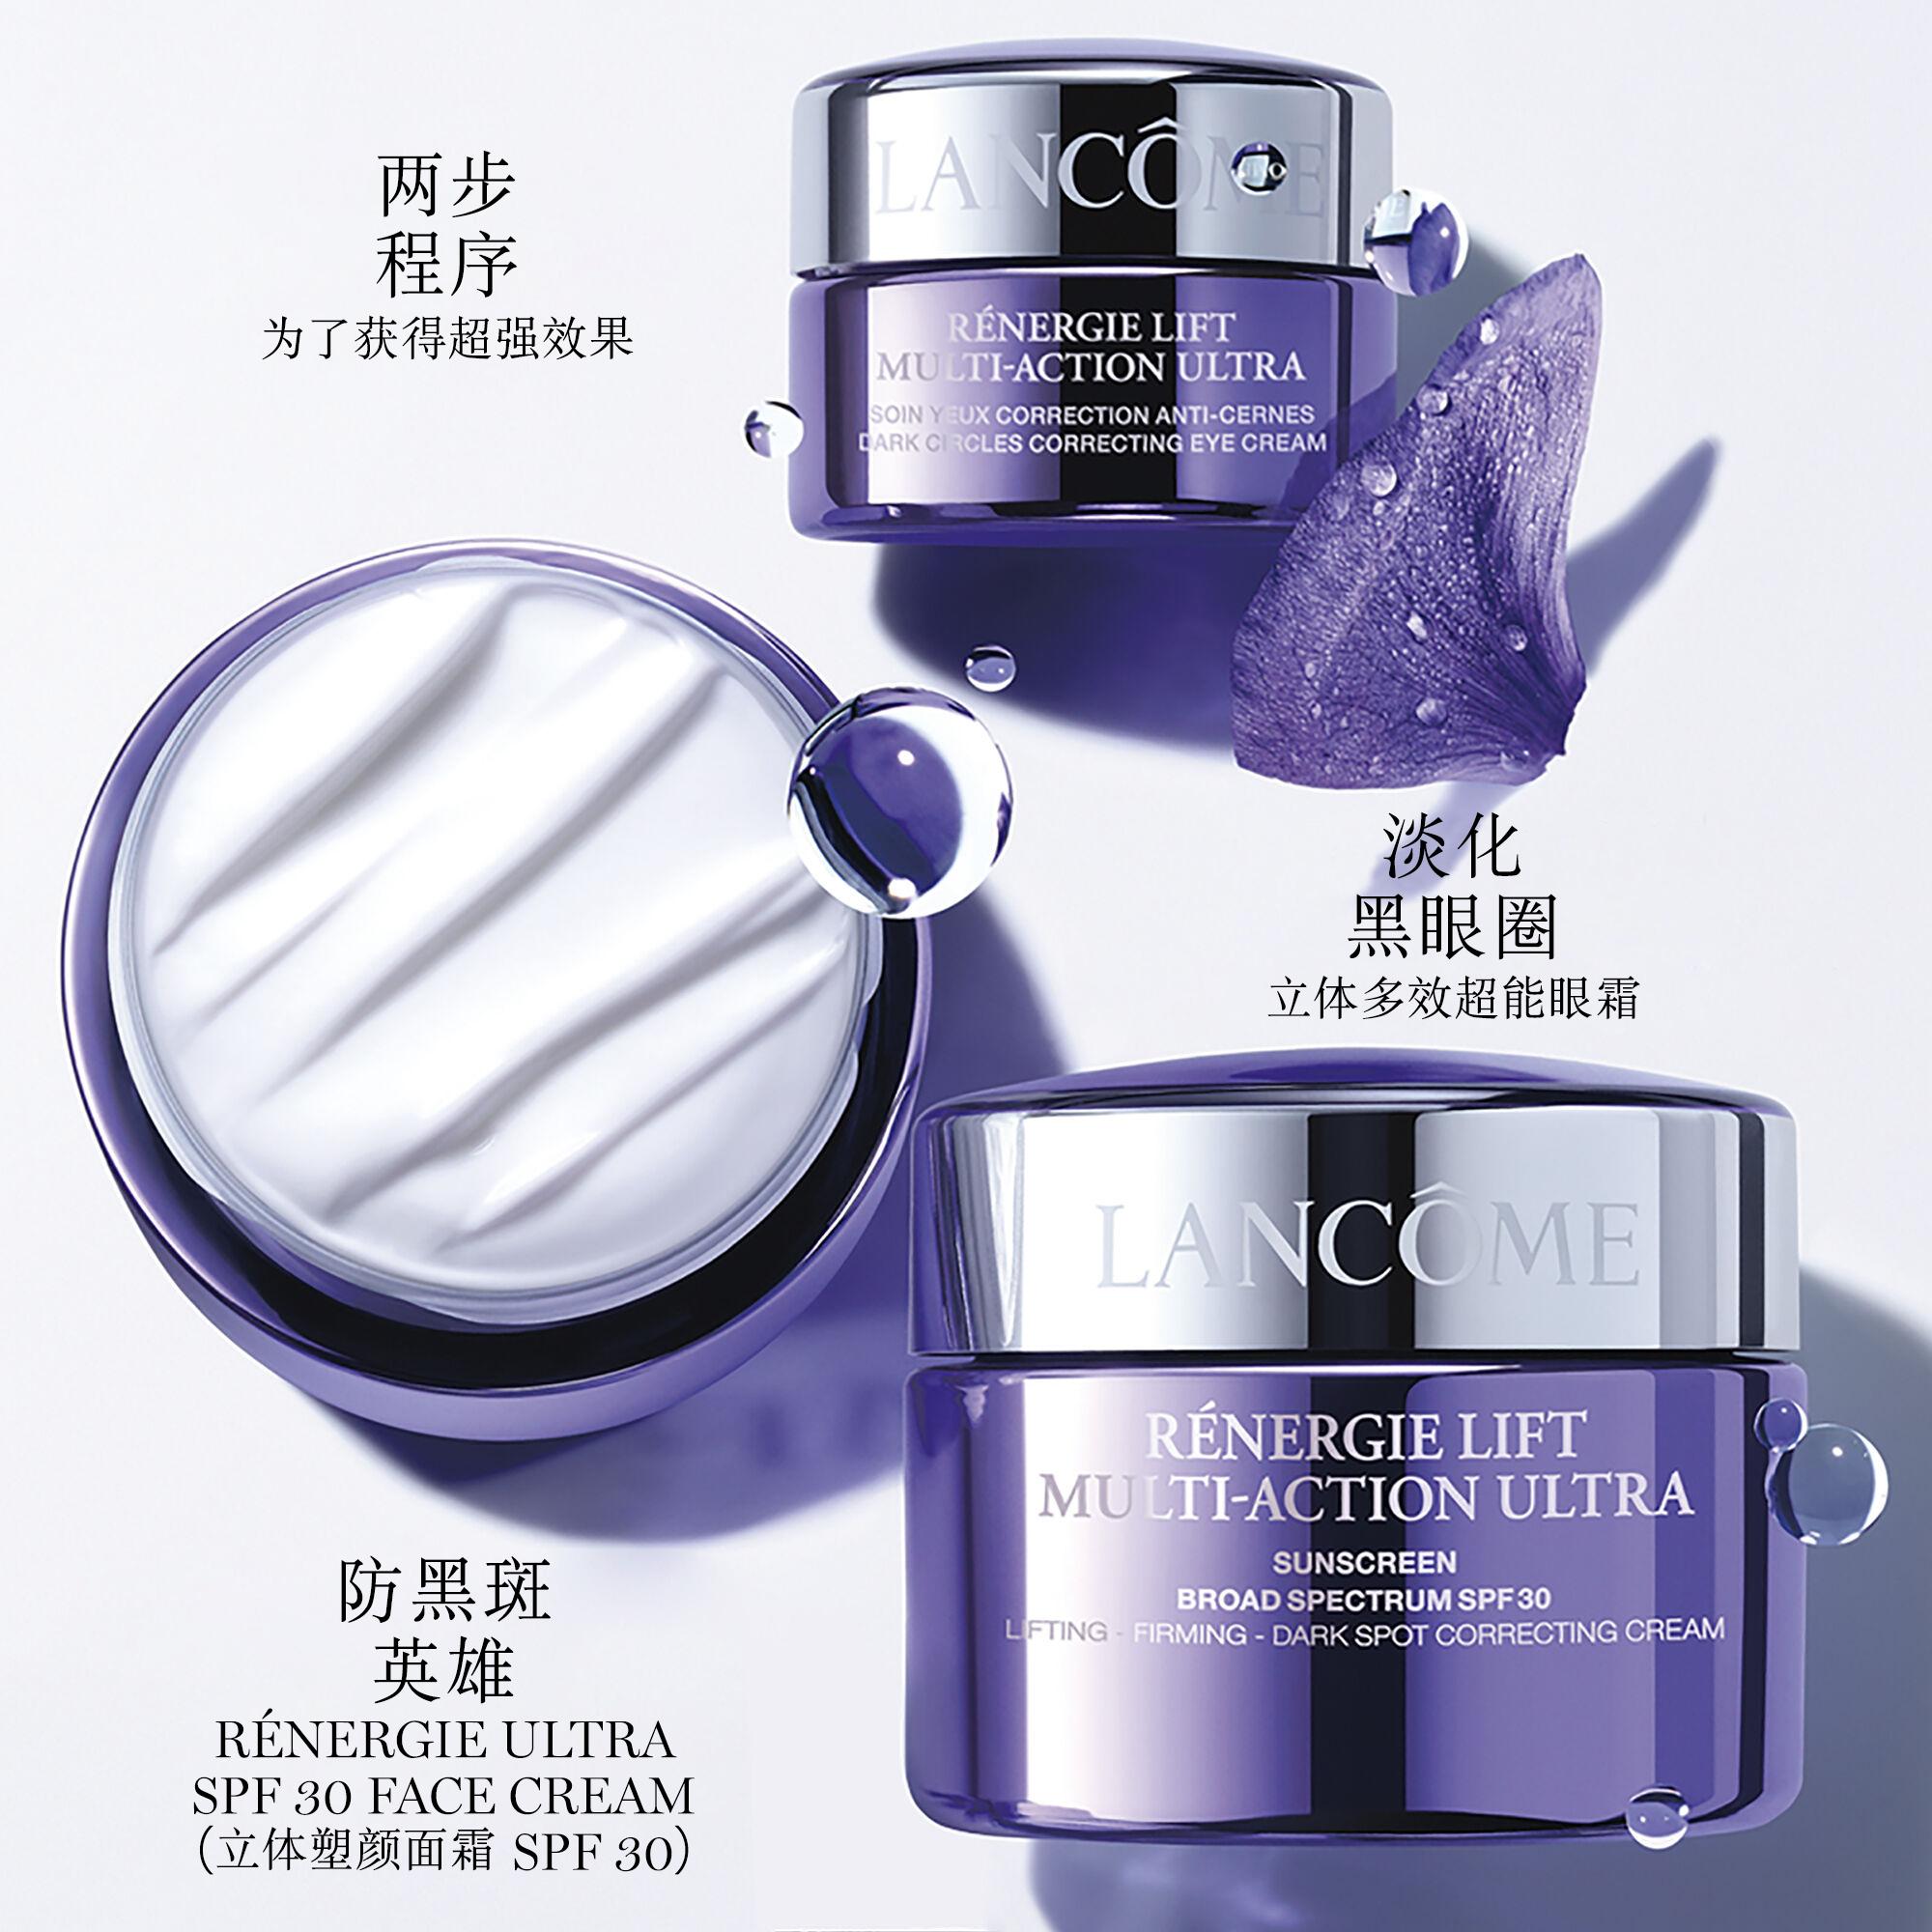 Renergie Lift Multi-Action Ultra Eye Cream(立体塑颜多效眼霜)